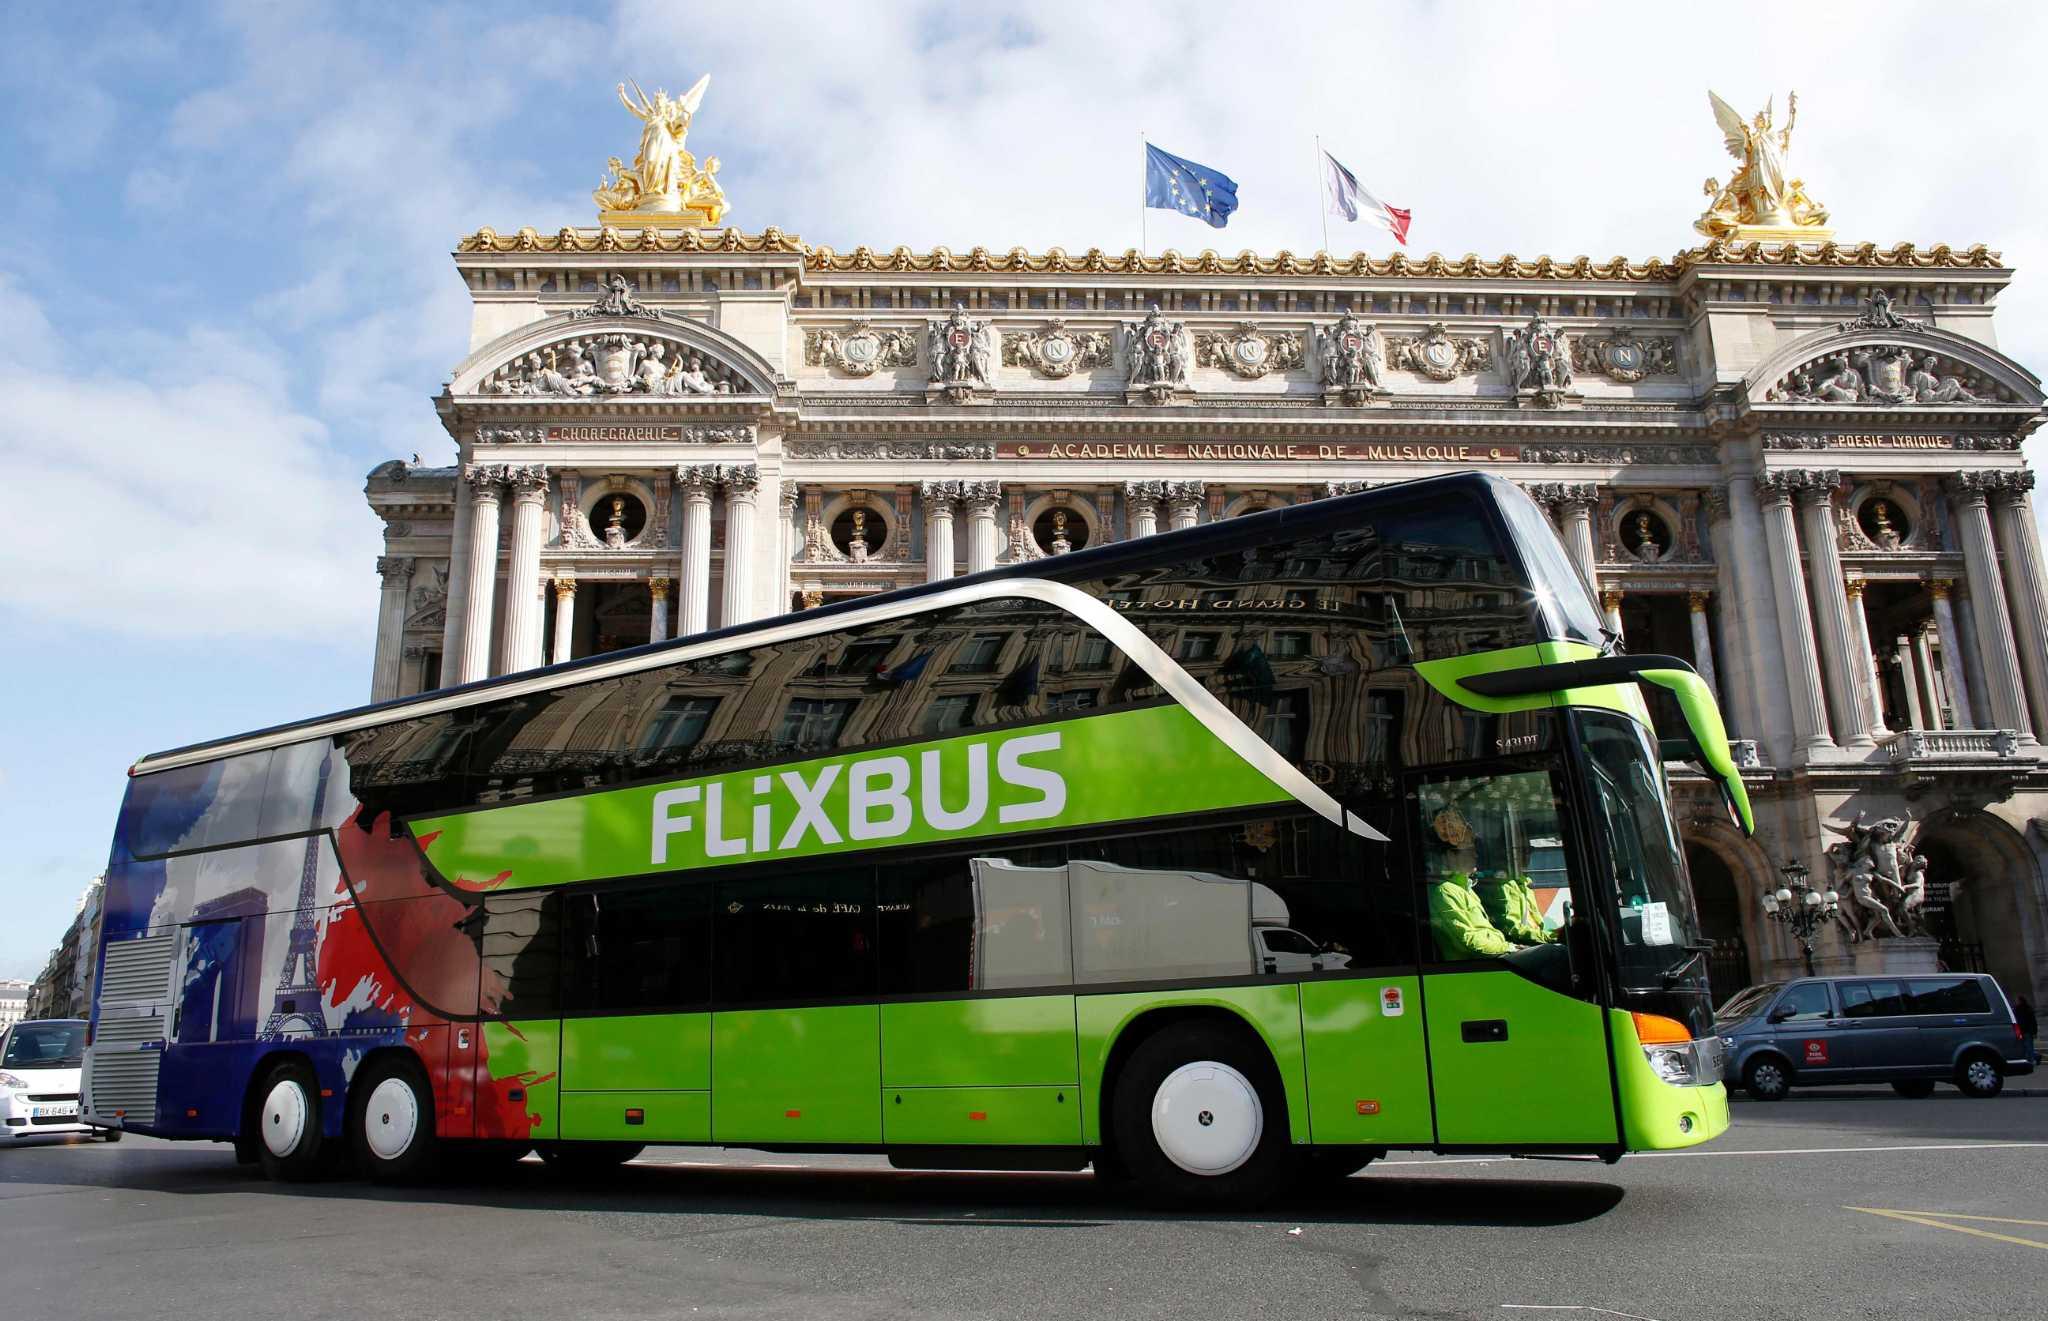 Flixbus The Latest Player In Gulf Coast Bus Service With Houston San Antonio Routes Houstonchronicle Com